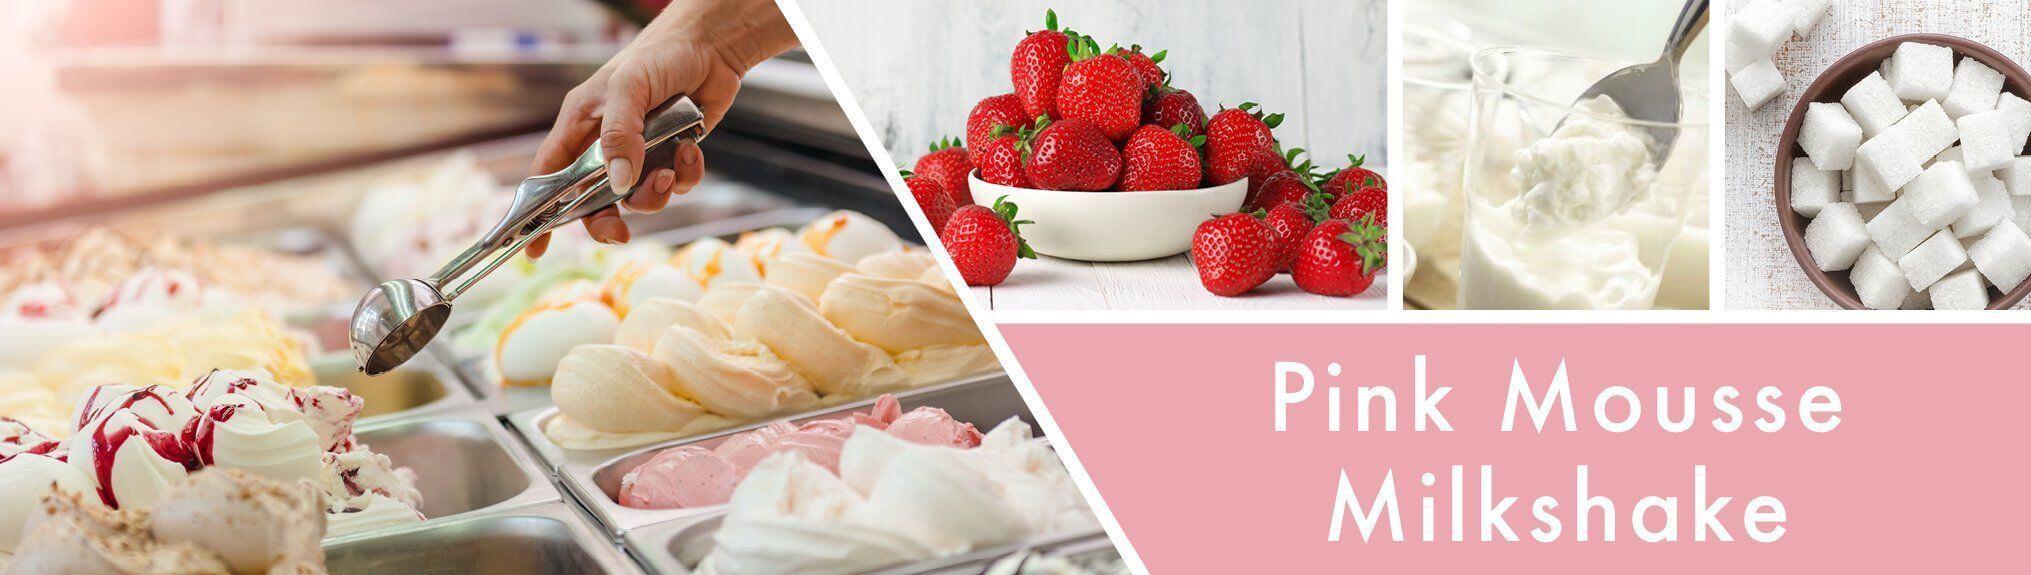 goose-creek-candle-pink-mousse-milkshake-3-docht